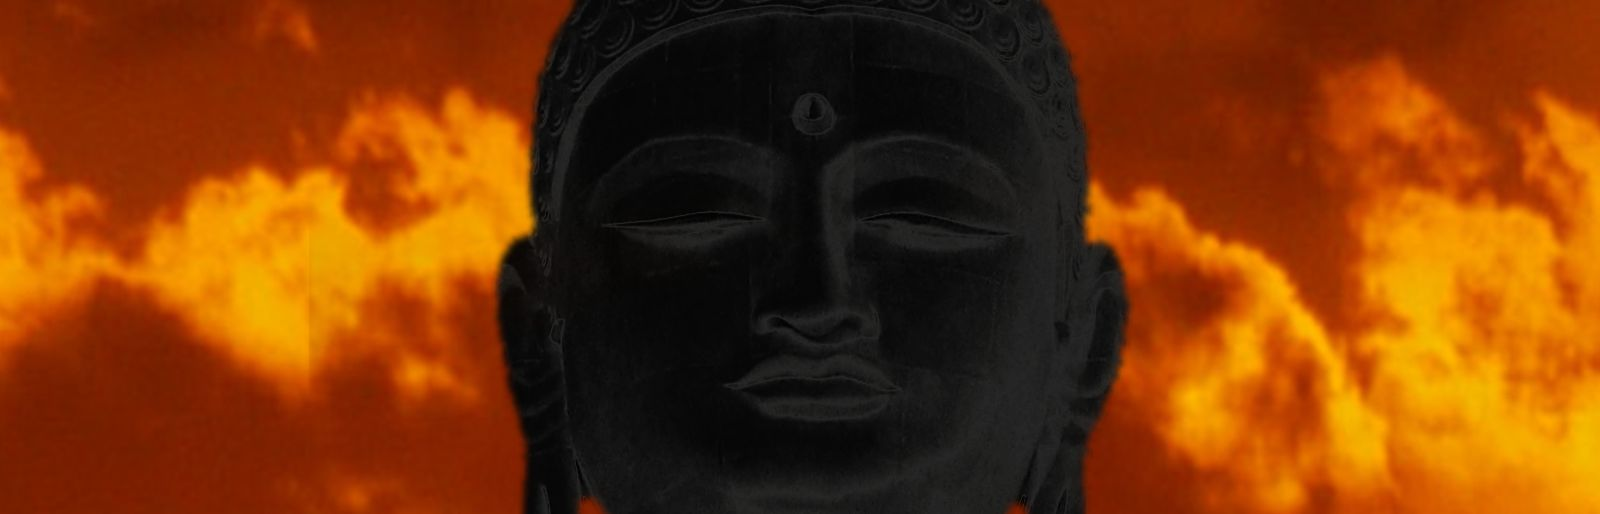 Dhammapada –  Discursos de Siddhartha